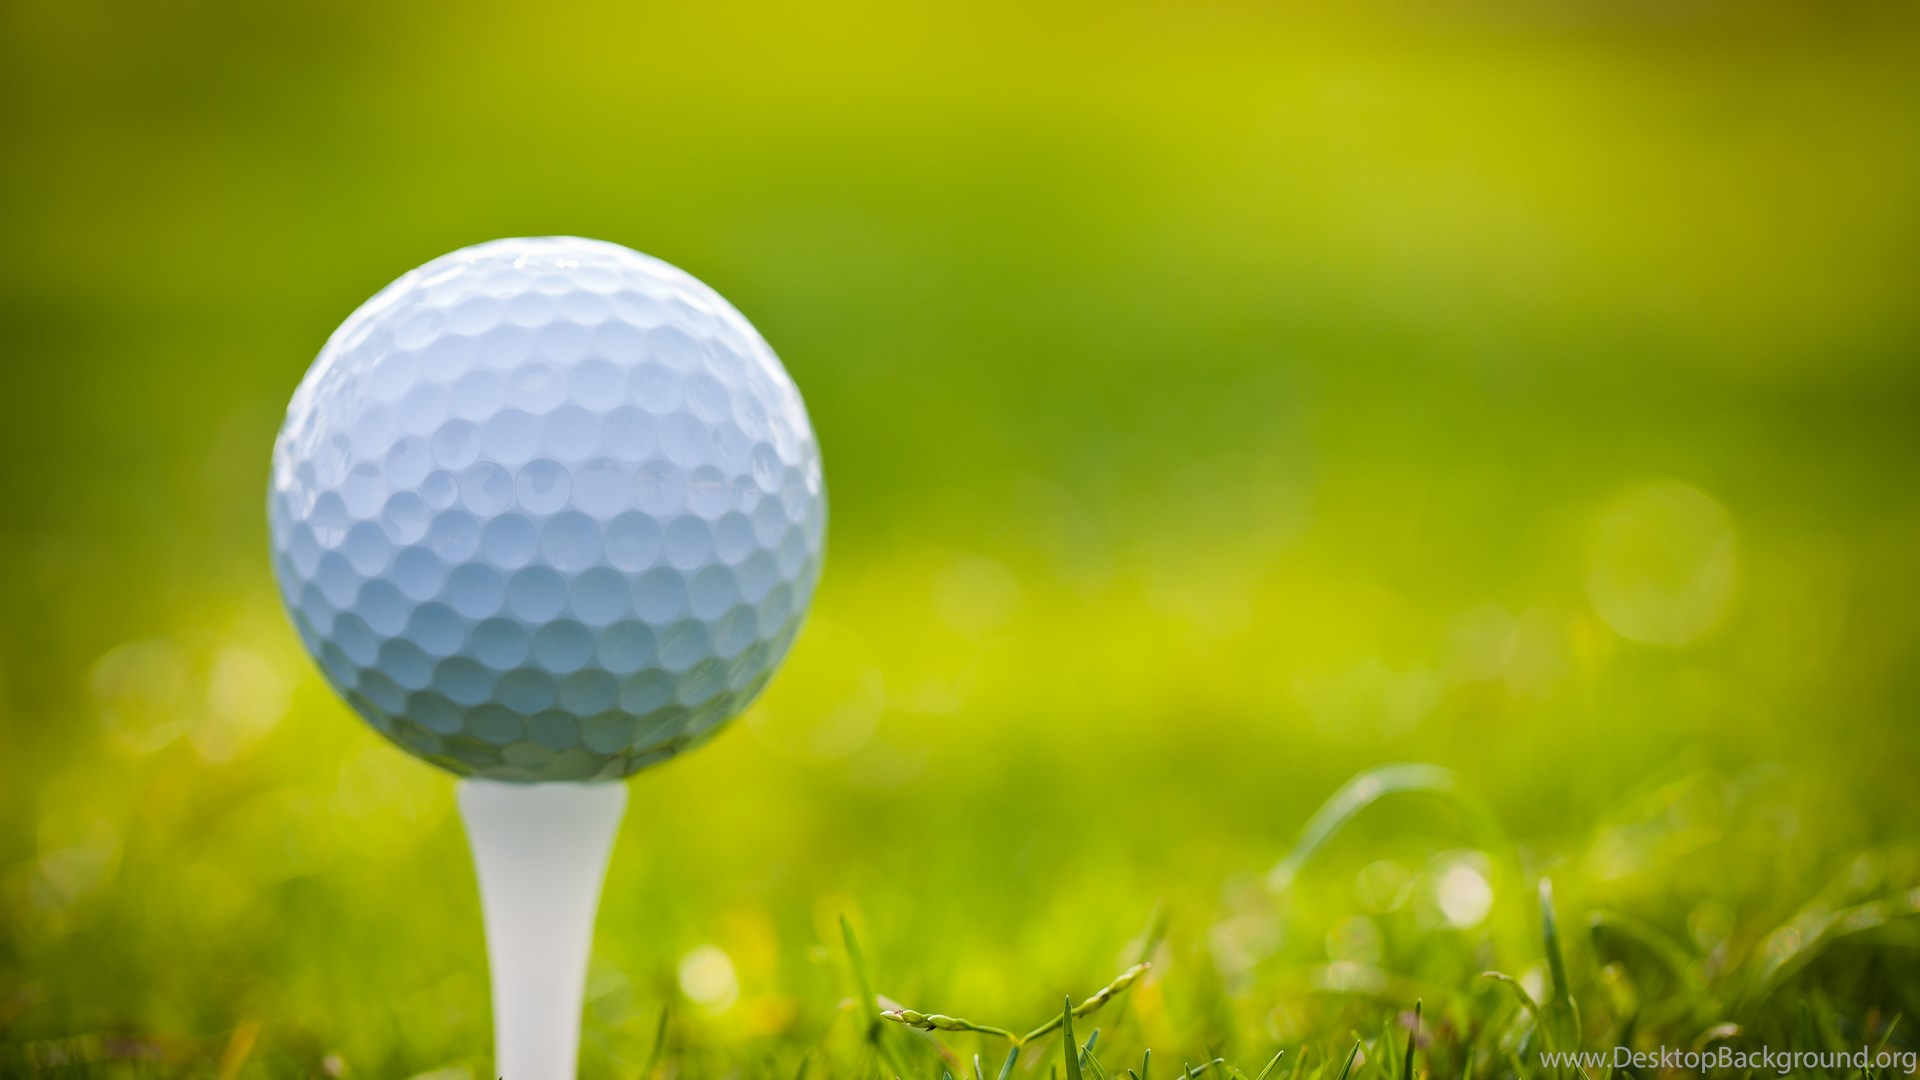 Free Golf Course Clip Art Wallpapers Desktop Kemecer Com Desktop Background